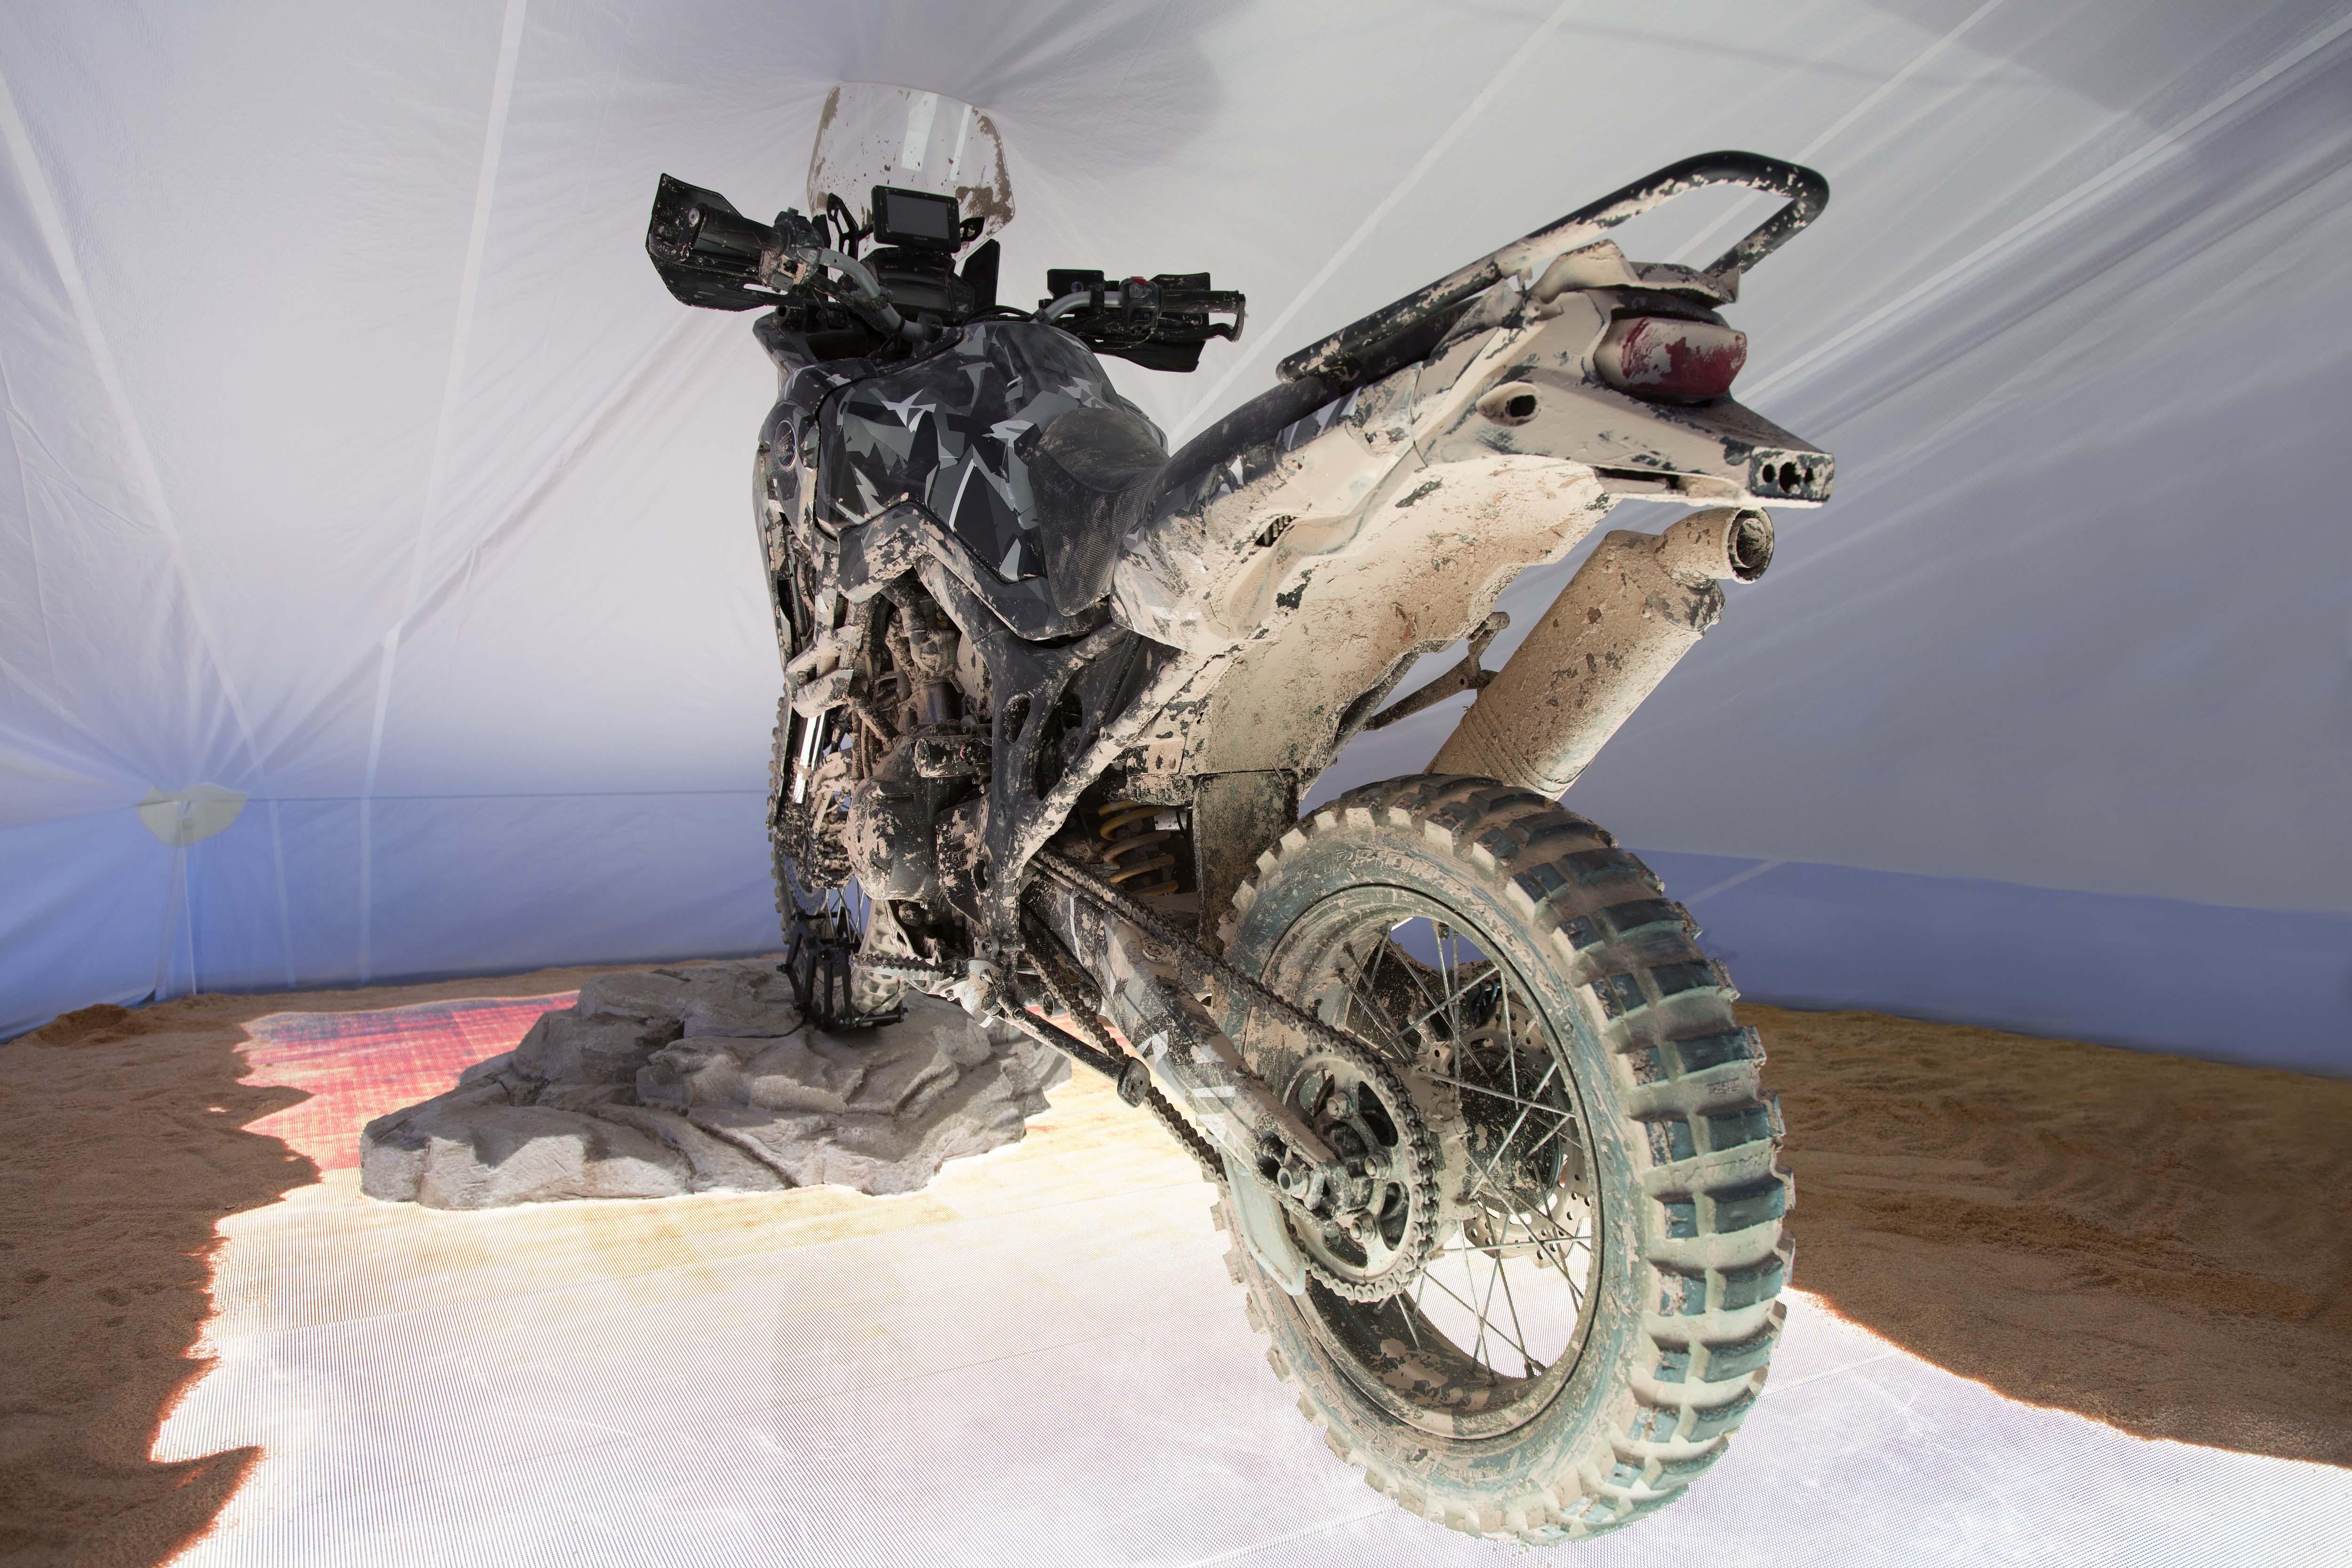 http://www.asphaltandrubber.com/wp-content/gallery/honda-africa-twin-prototype/2015-Honda-Africa-Twin-True-Adventure-Prototype-05.jpg